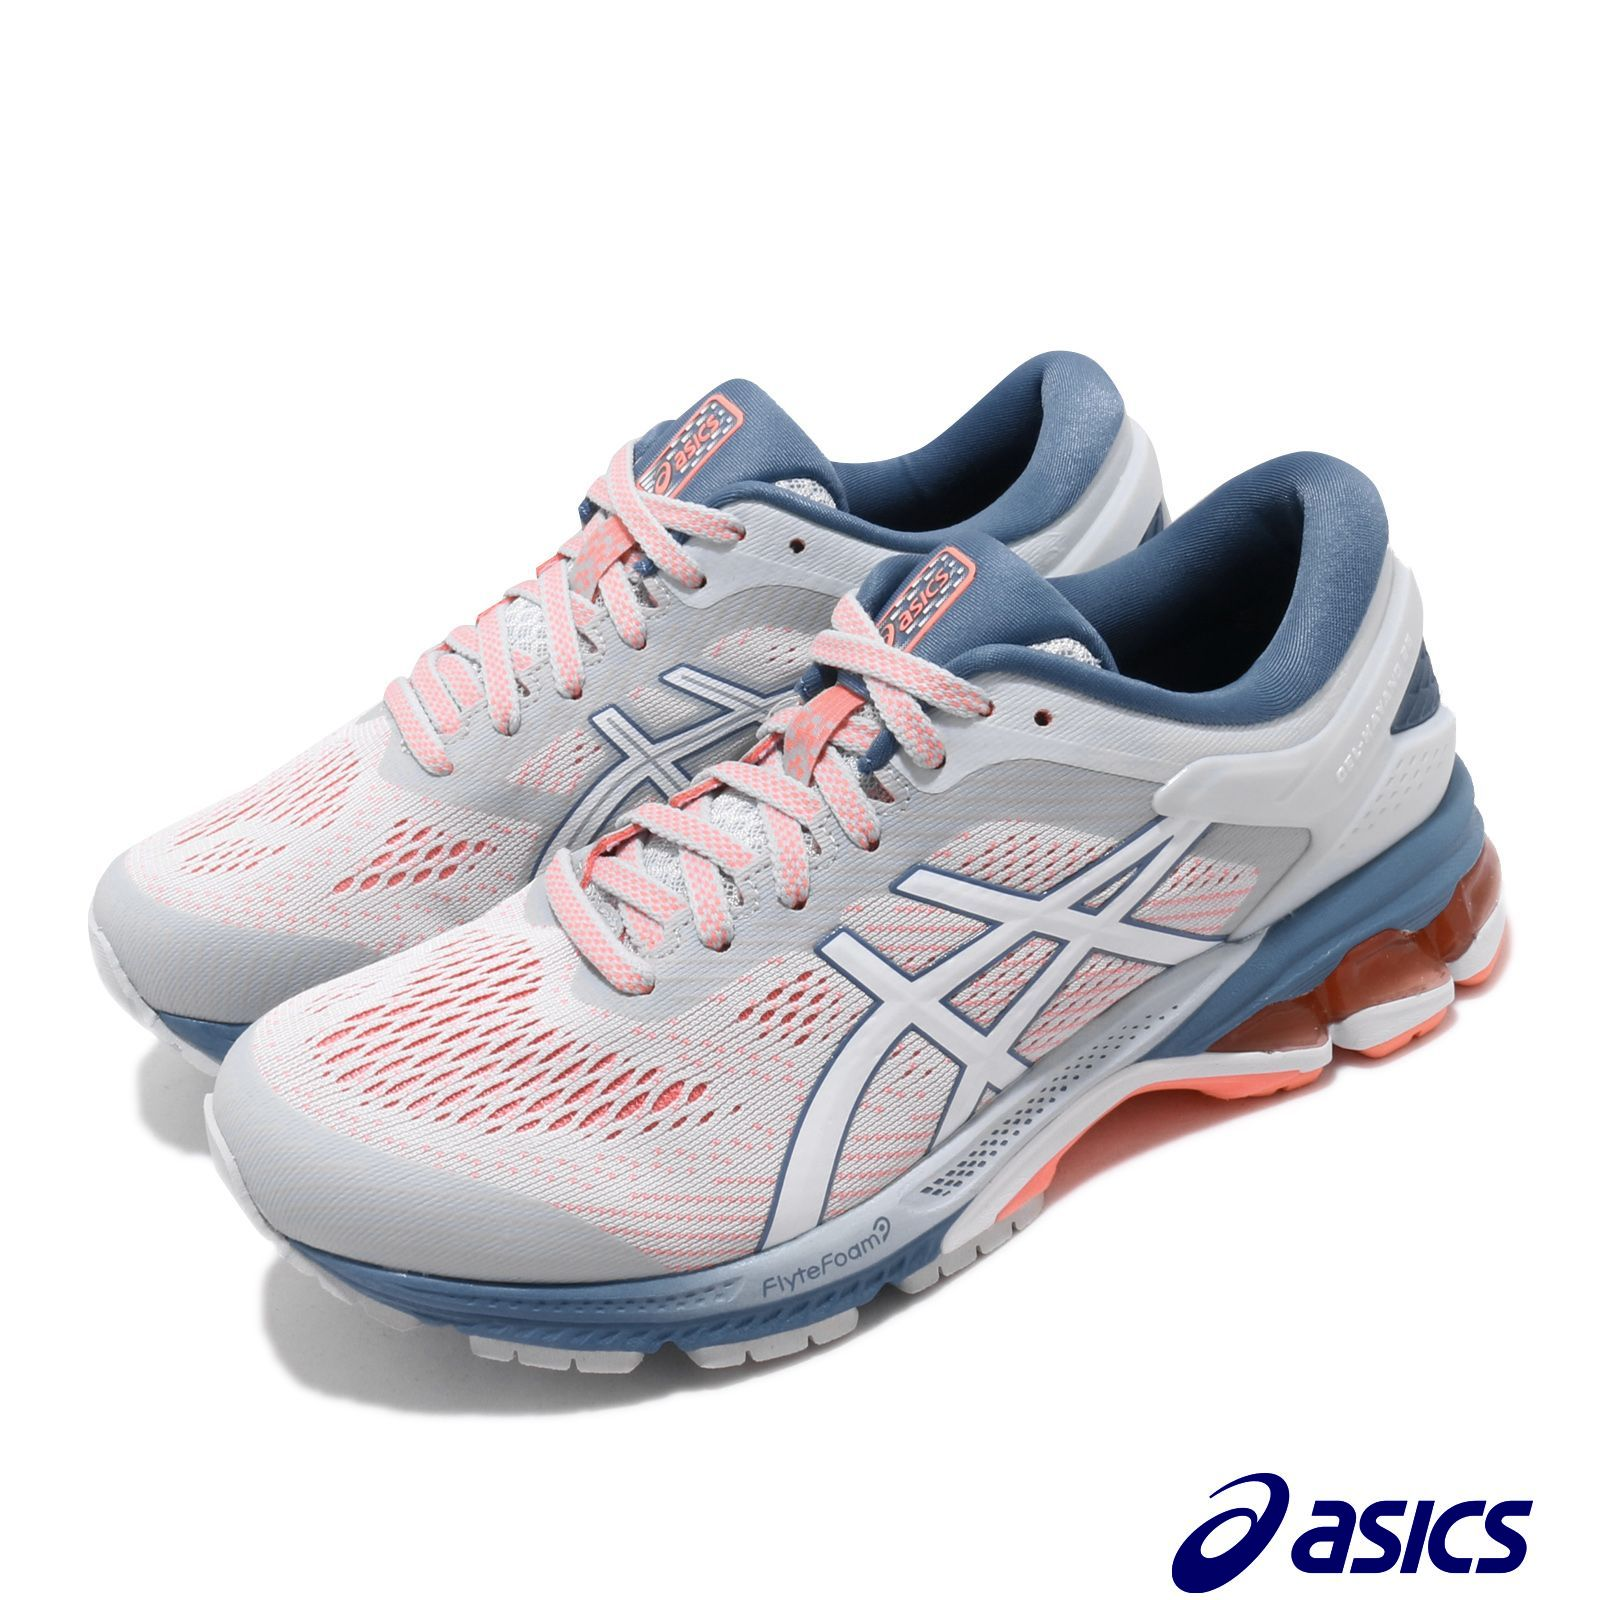 Asics 慢跑鞋 Gel-Kayano 26 D 寬楦 女鞋 1012A459021